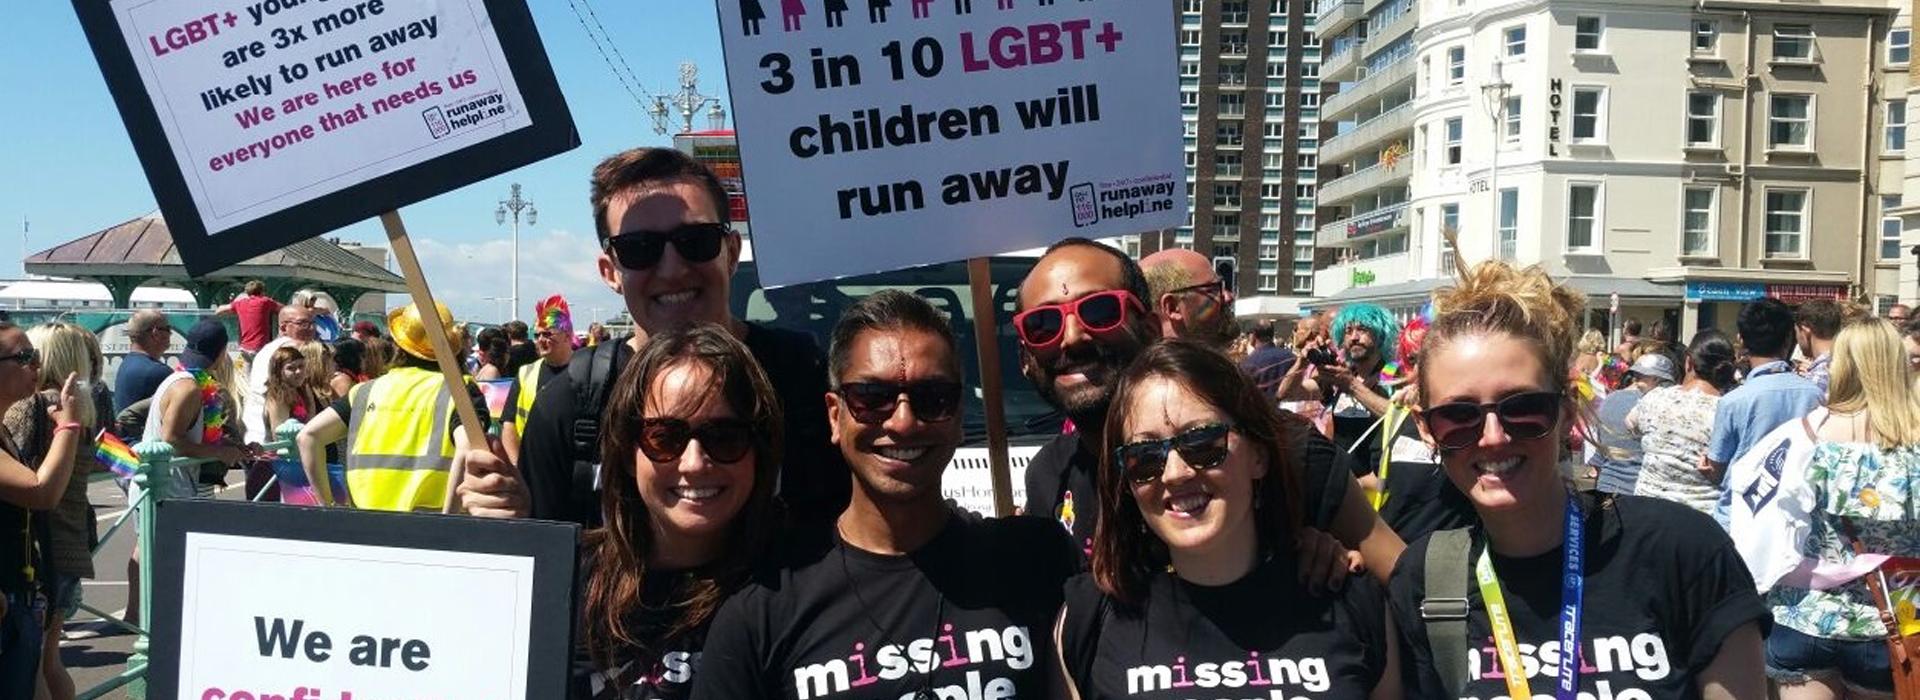 Missing People volunteers at LGBT event